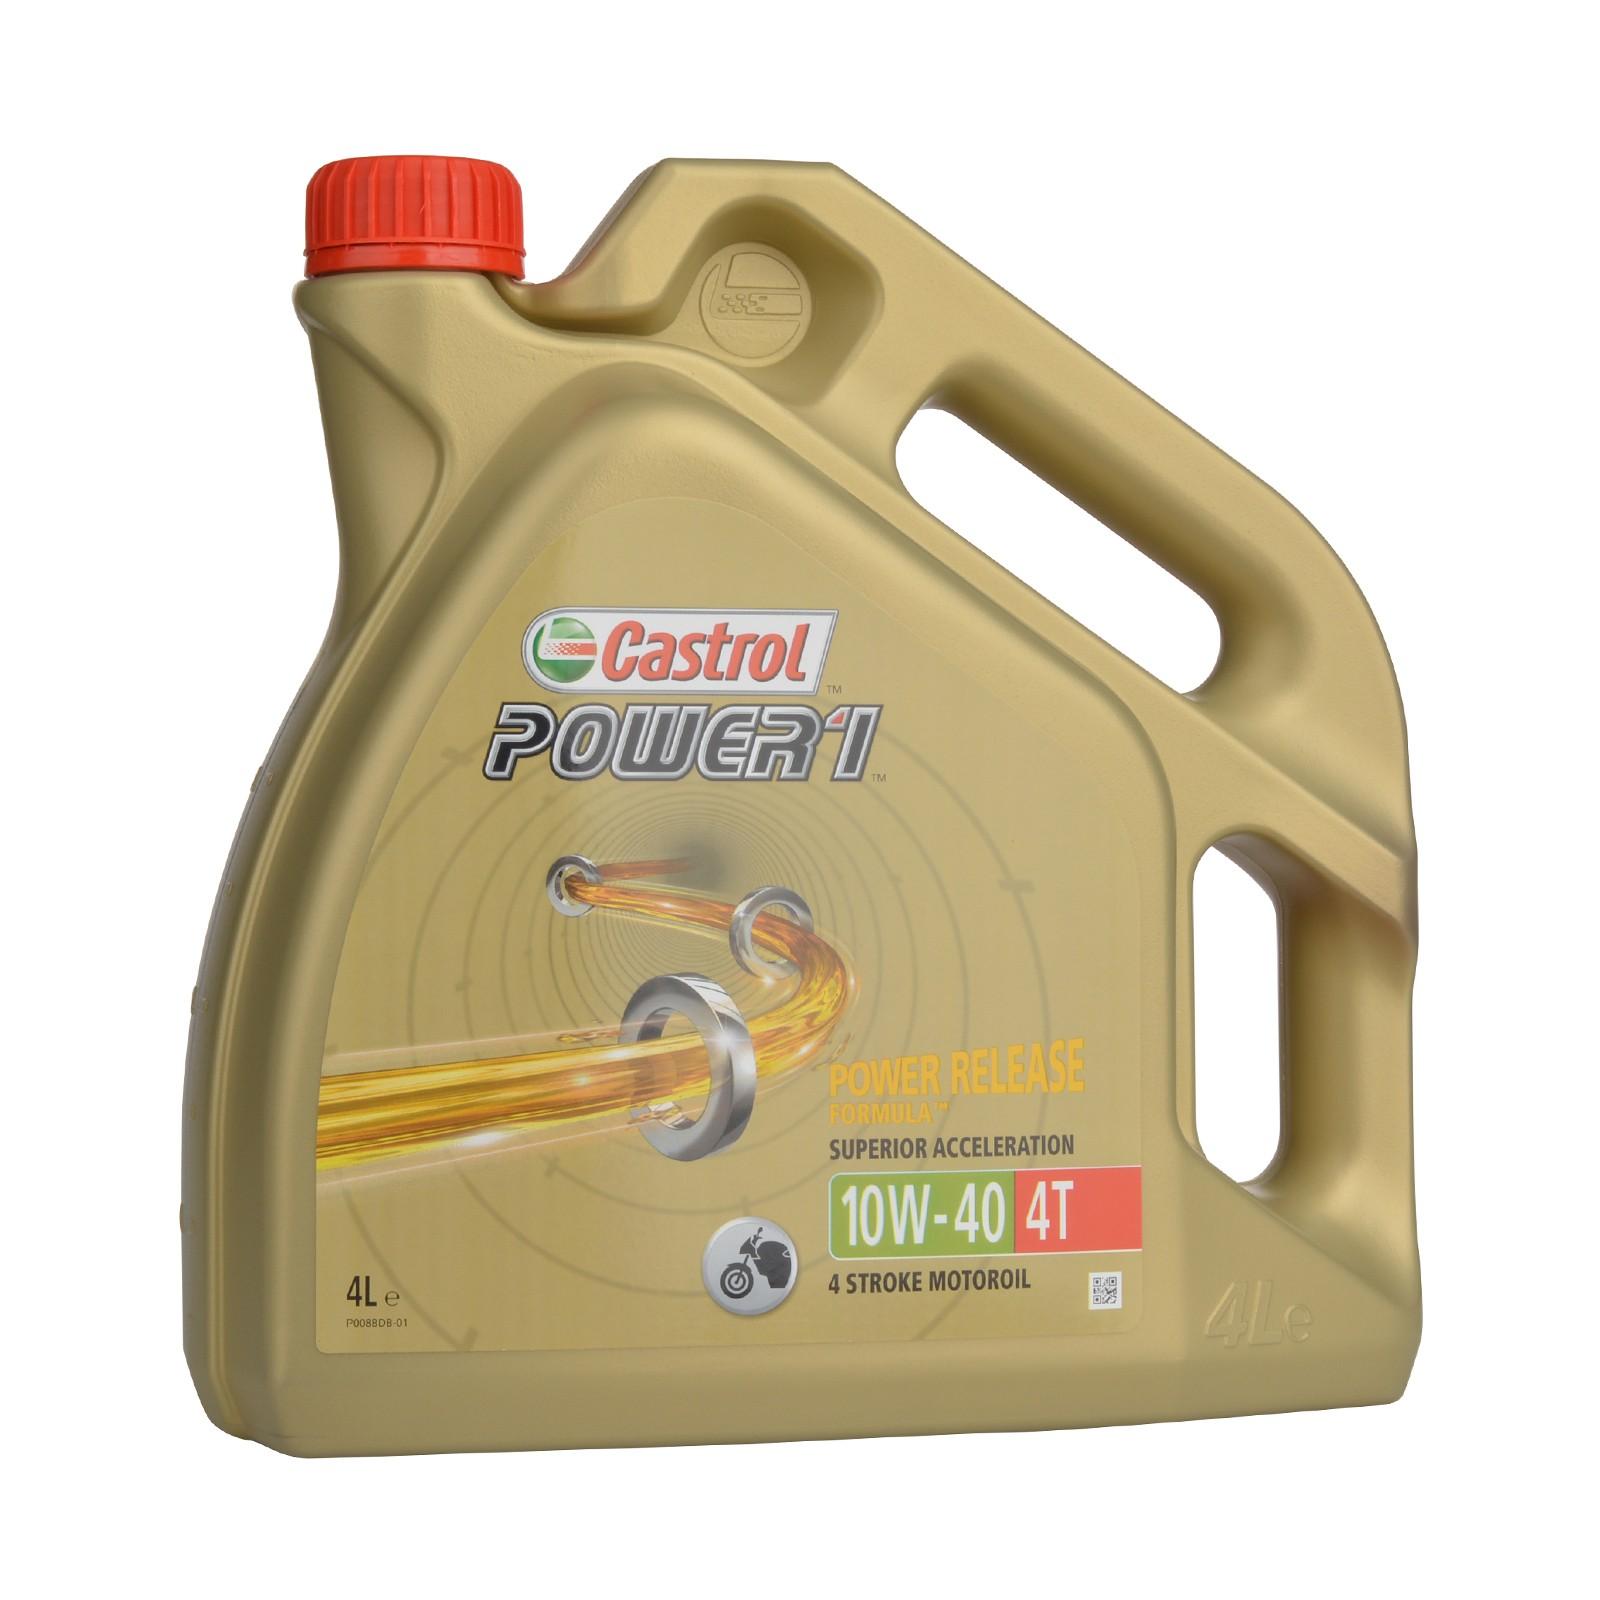 Castrol Power 1 4T 10W-40 - 4 Liter – Bild 1